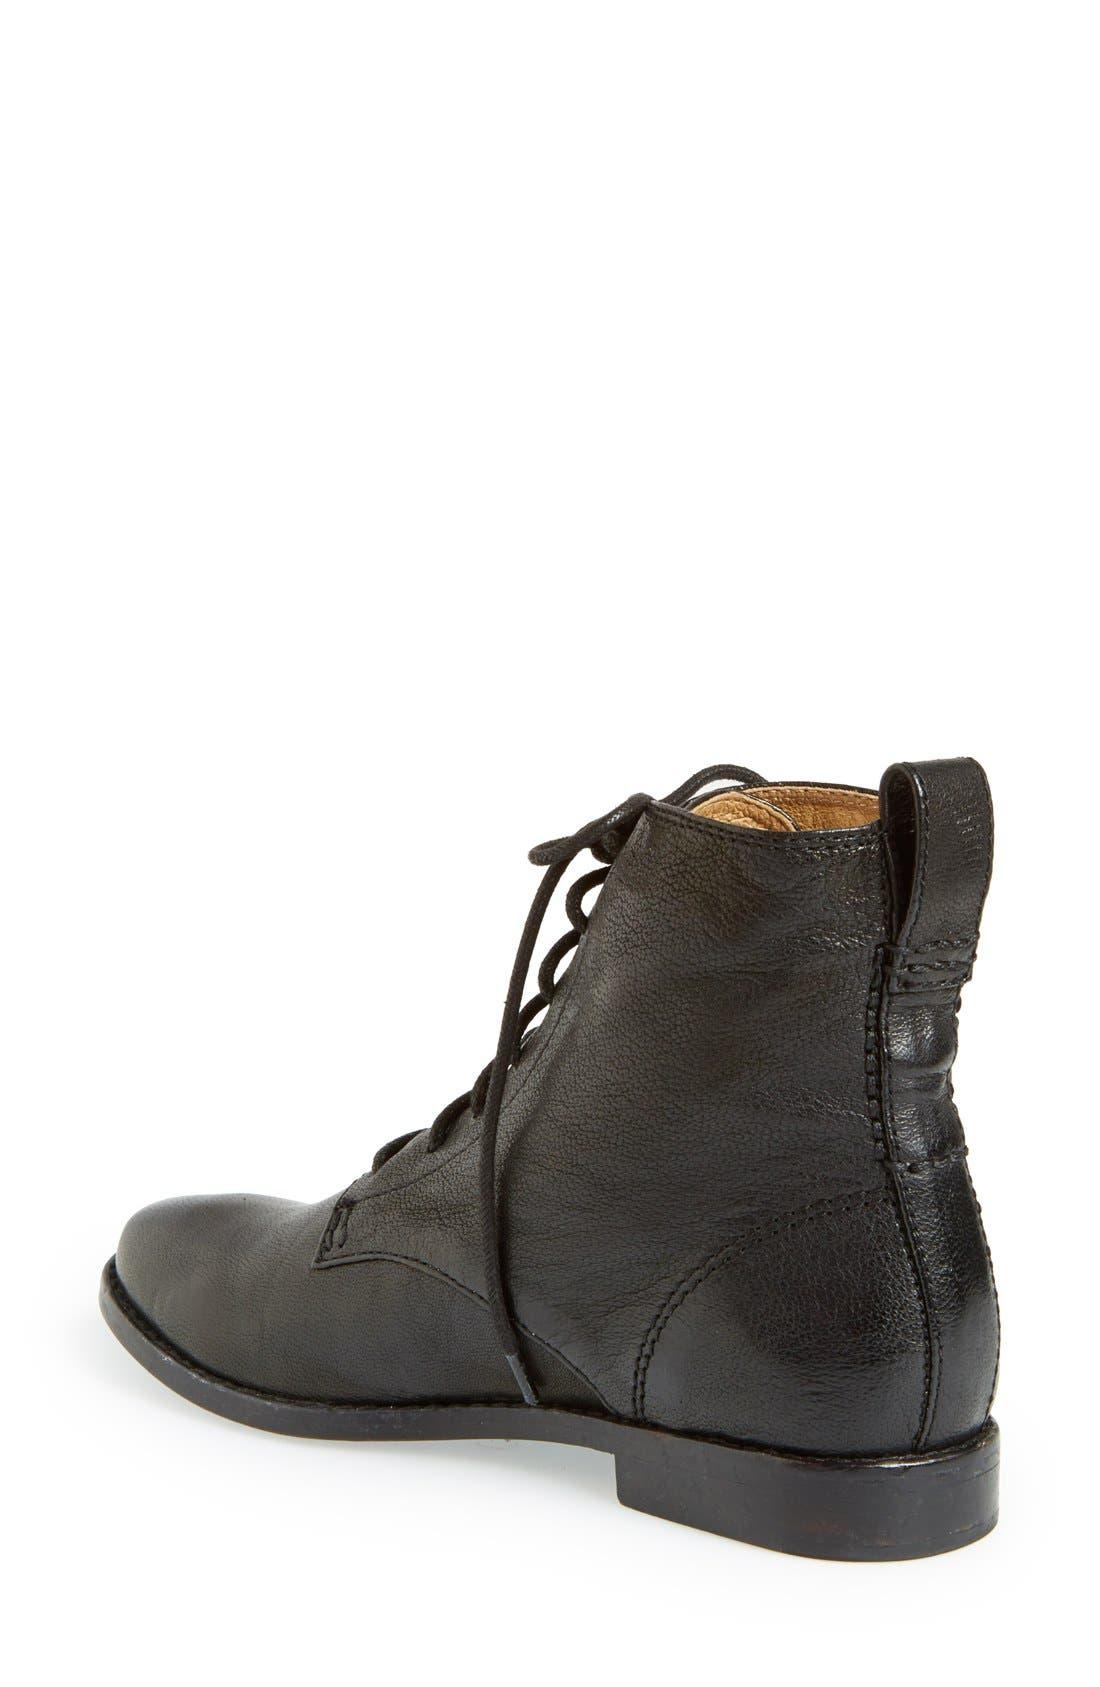 Alternate Image 2  - Frye 'Anna' Lace-Up Boot (Women)